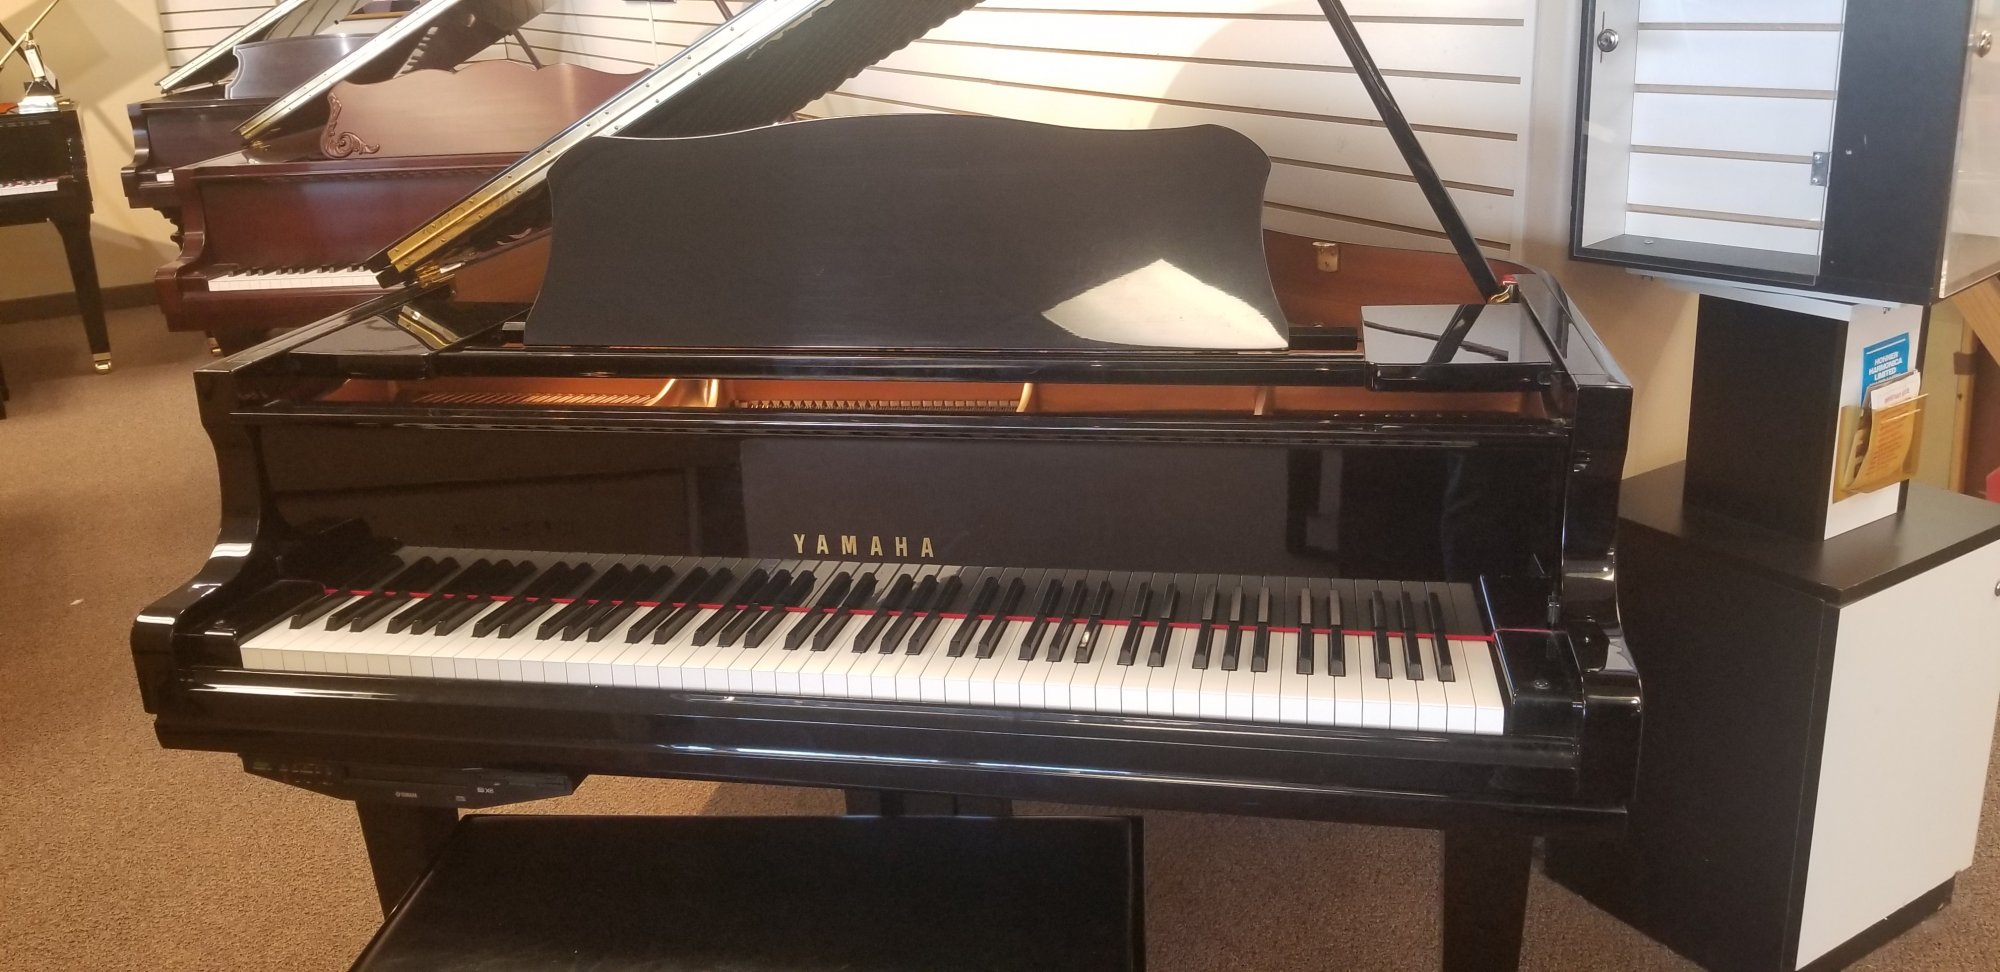 Yamaha GC1 Enspire Disklavier Grand Piano (Used)